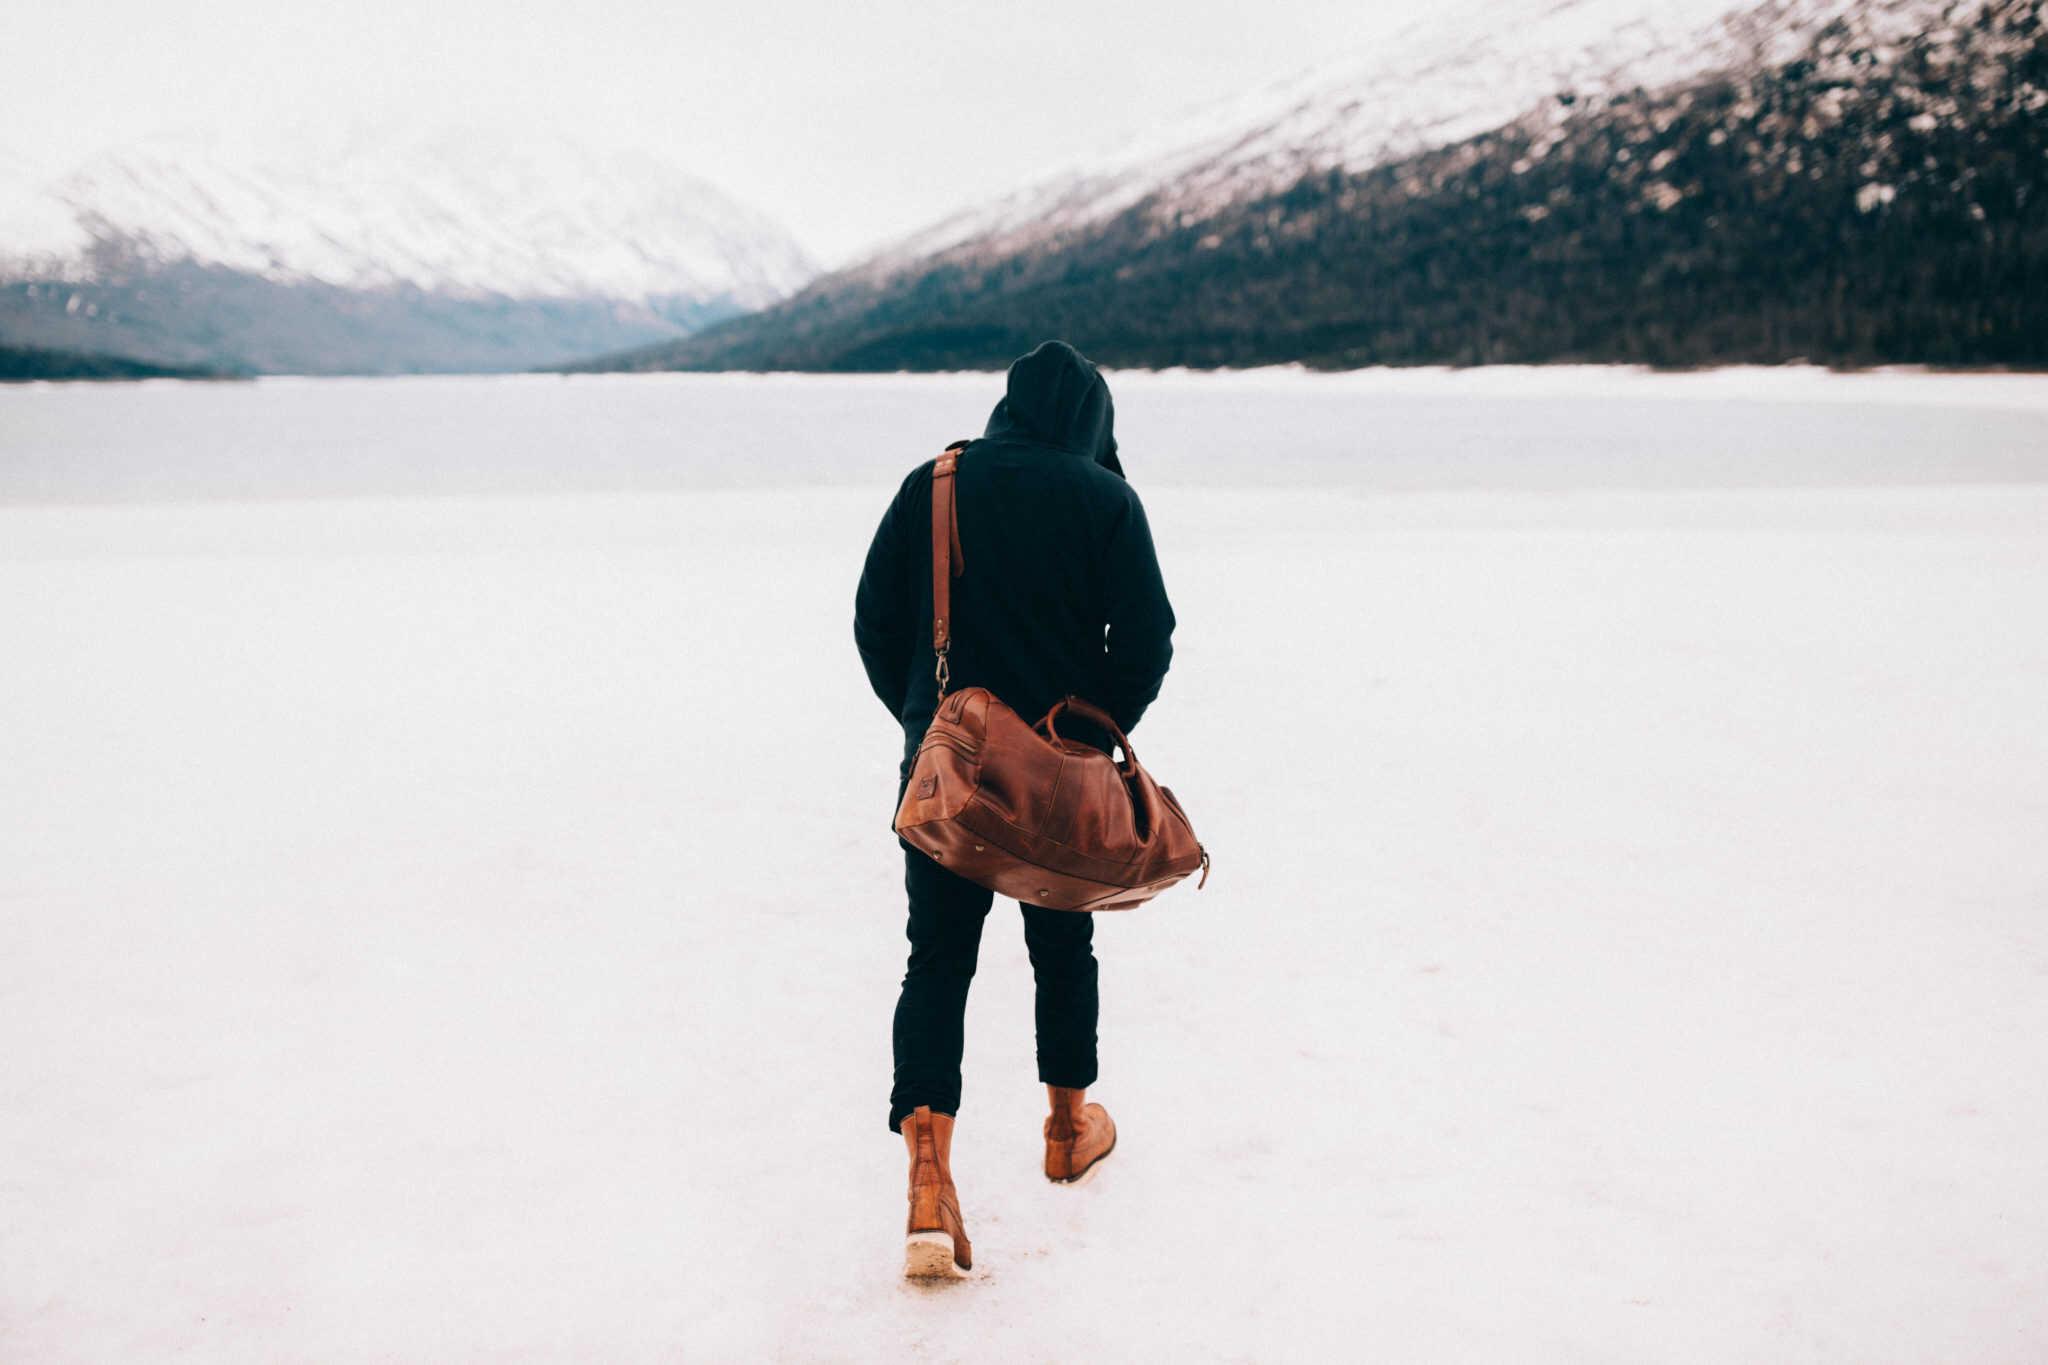 Frozen Eklutna Lake - Anchorage, Alaska